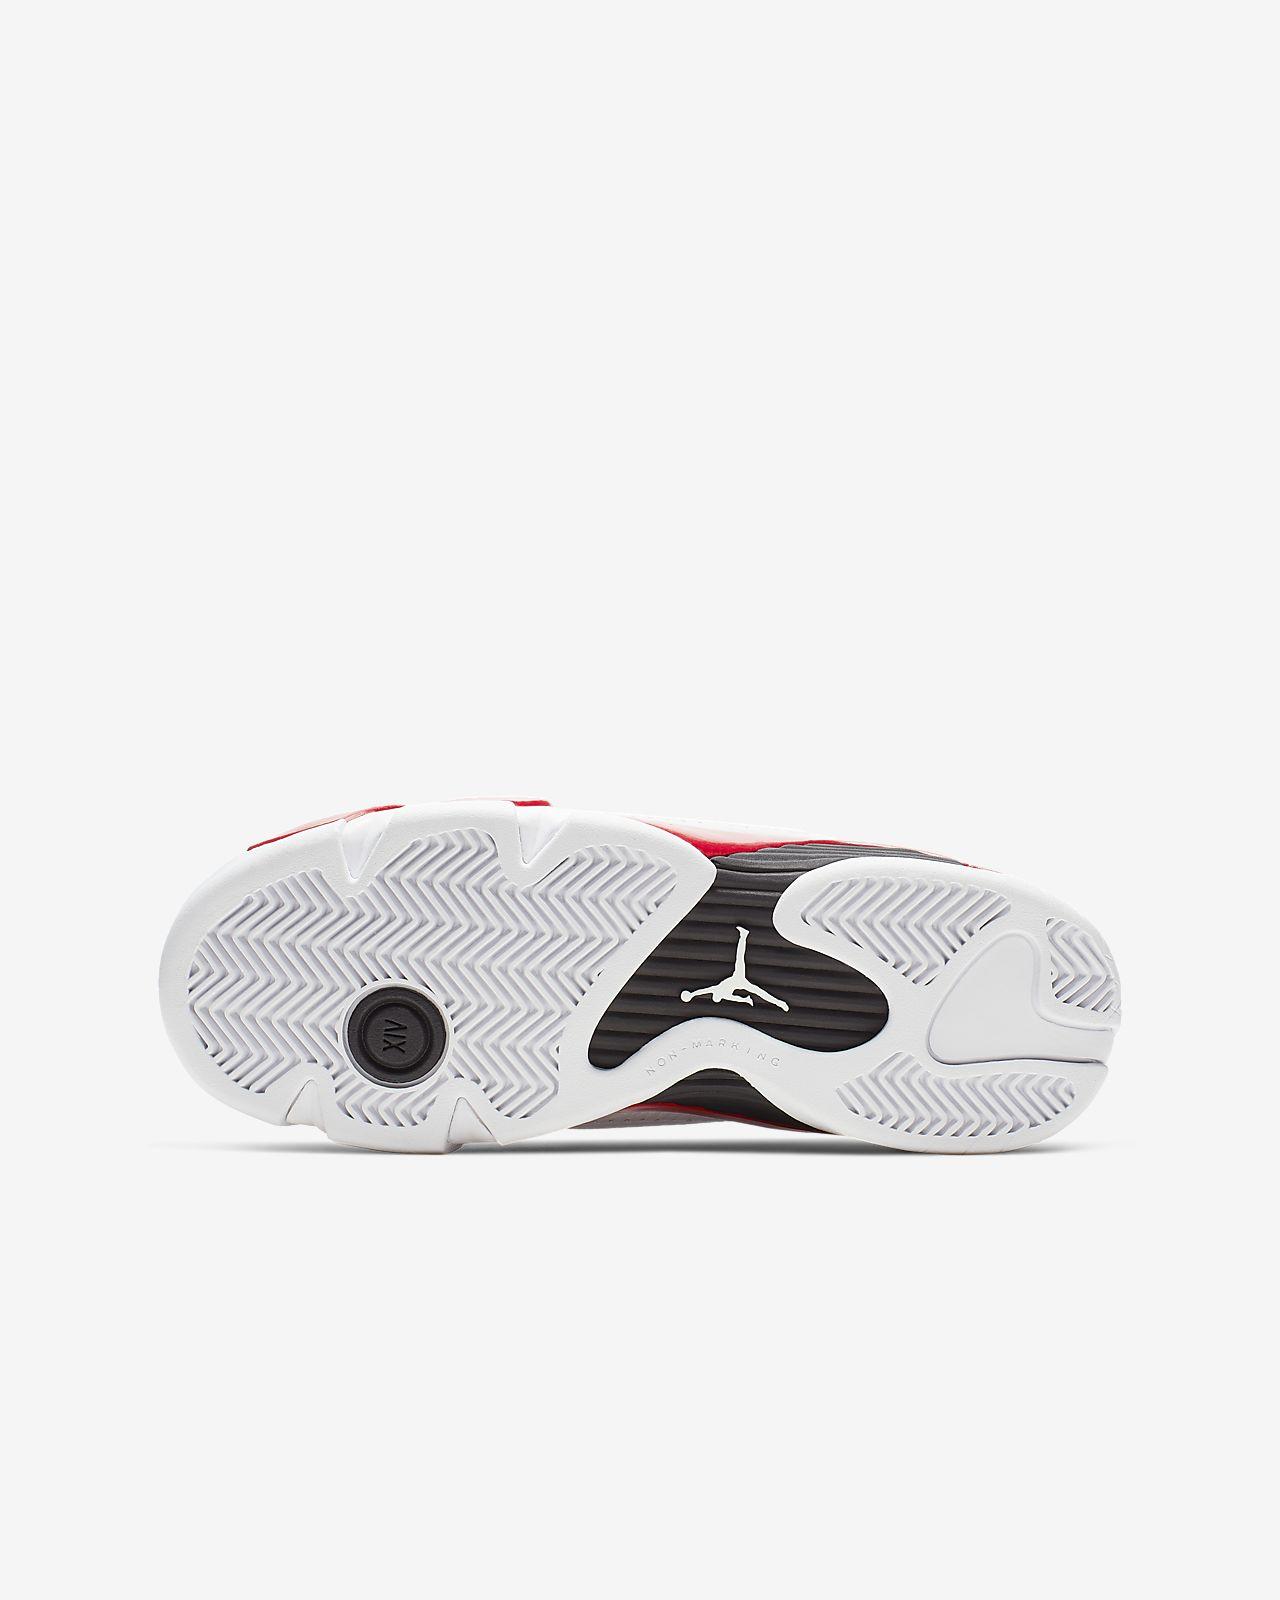 competitive price cadf4 109f8 ... Air Jordan 14 Retro Big Kids  Shoe